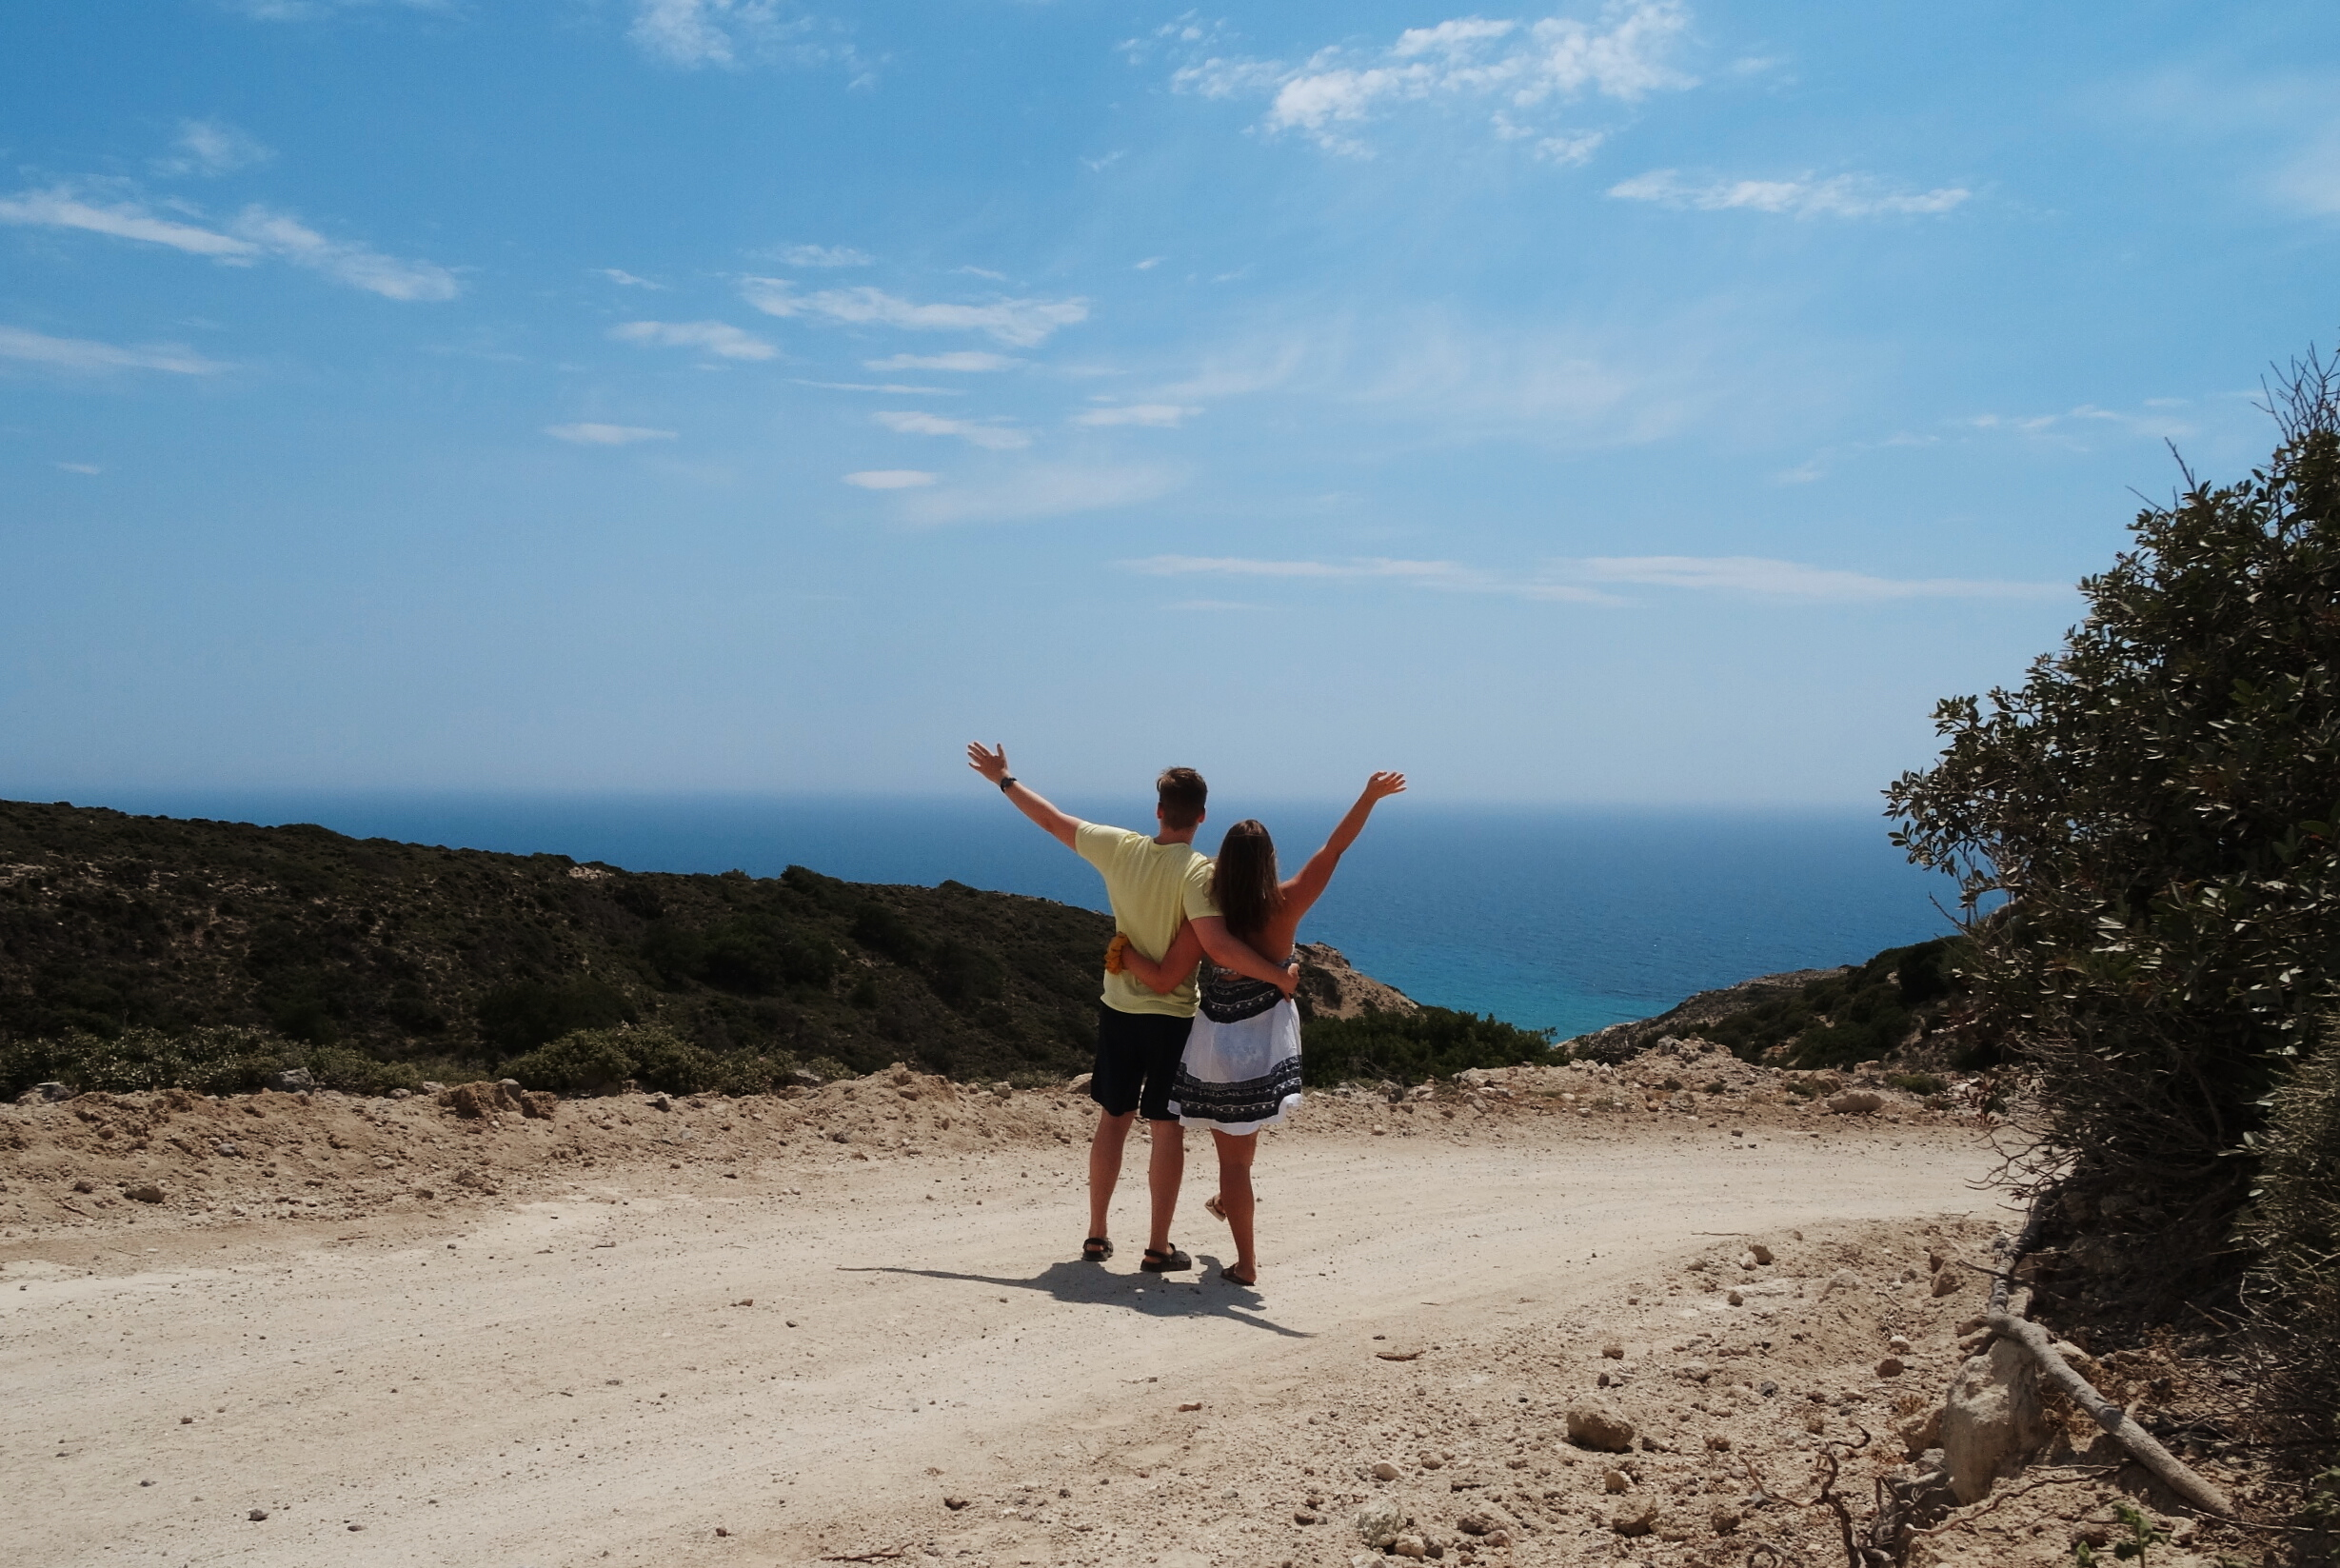 kokemuksia-kos-kreikka-kavo-paradiso-mona-kajander-matkablogi